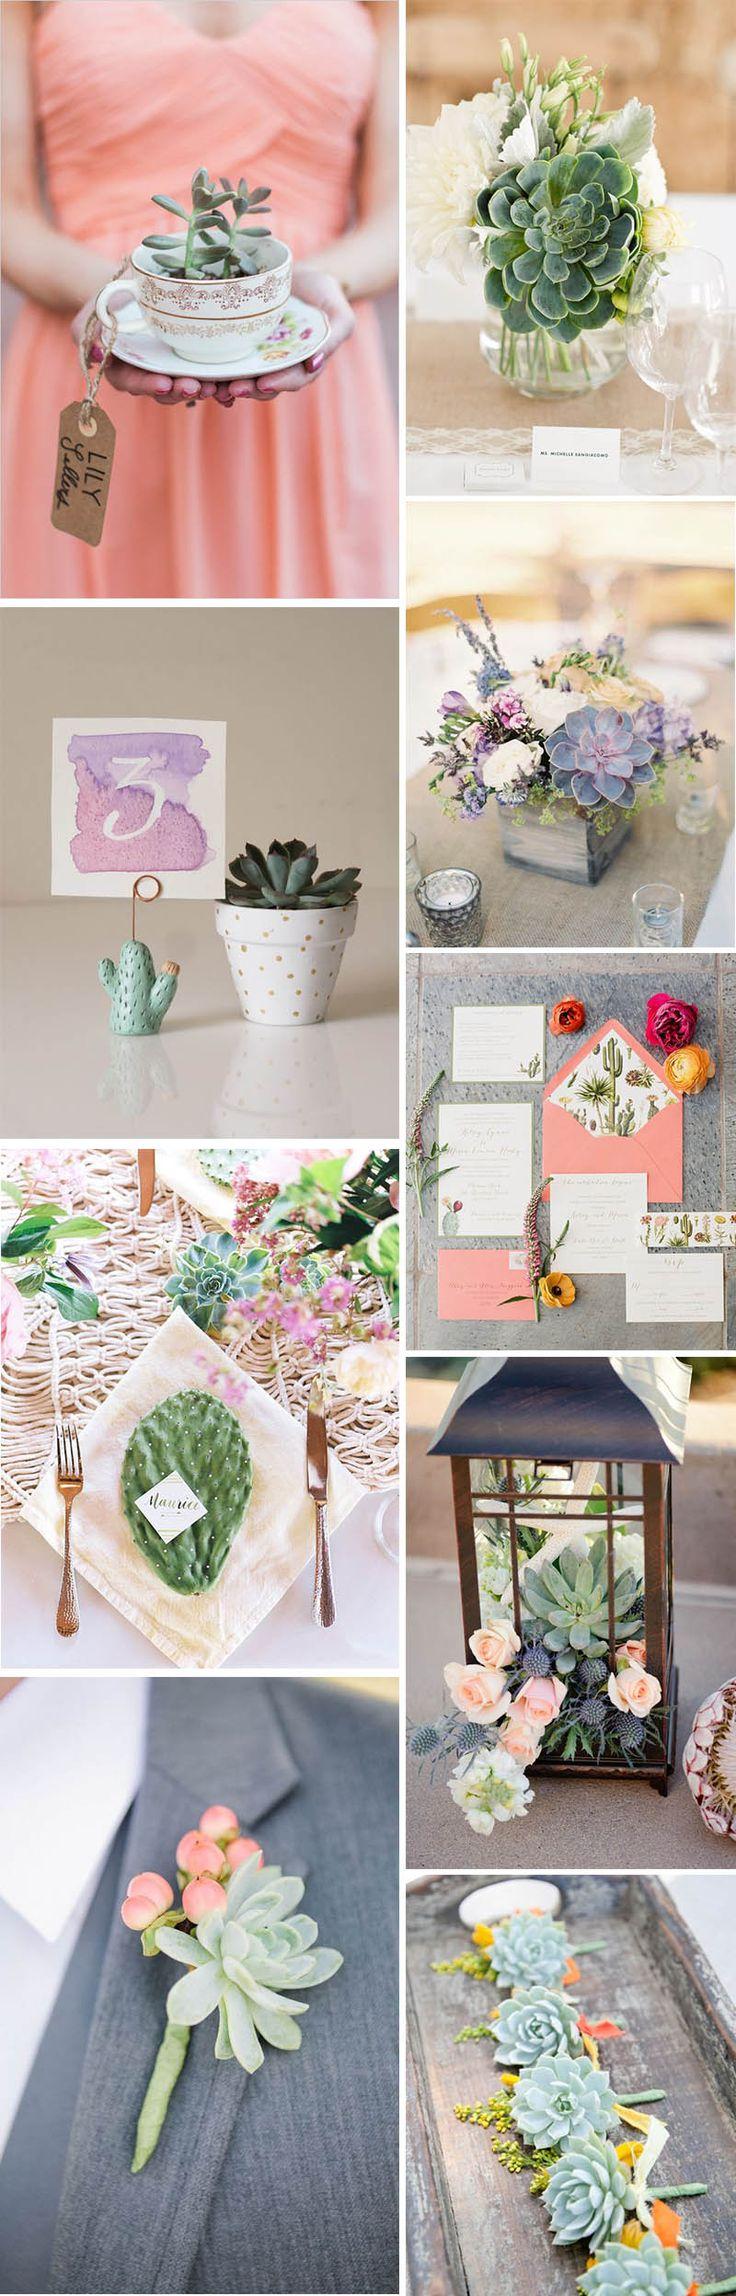 Mood Board Wedding Succulent Plants Decoration // Wedding cactus Decoration // Ecofriendly Wedding #succulents #ecofriendly